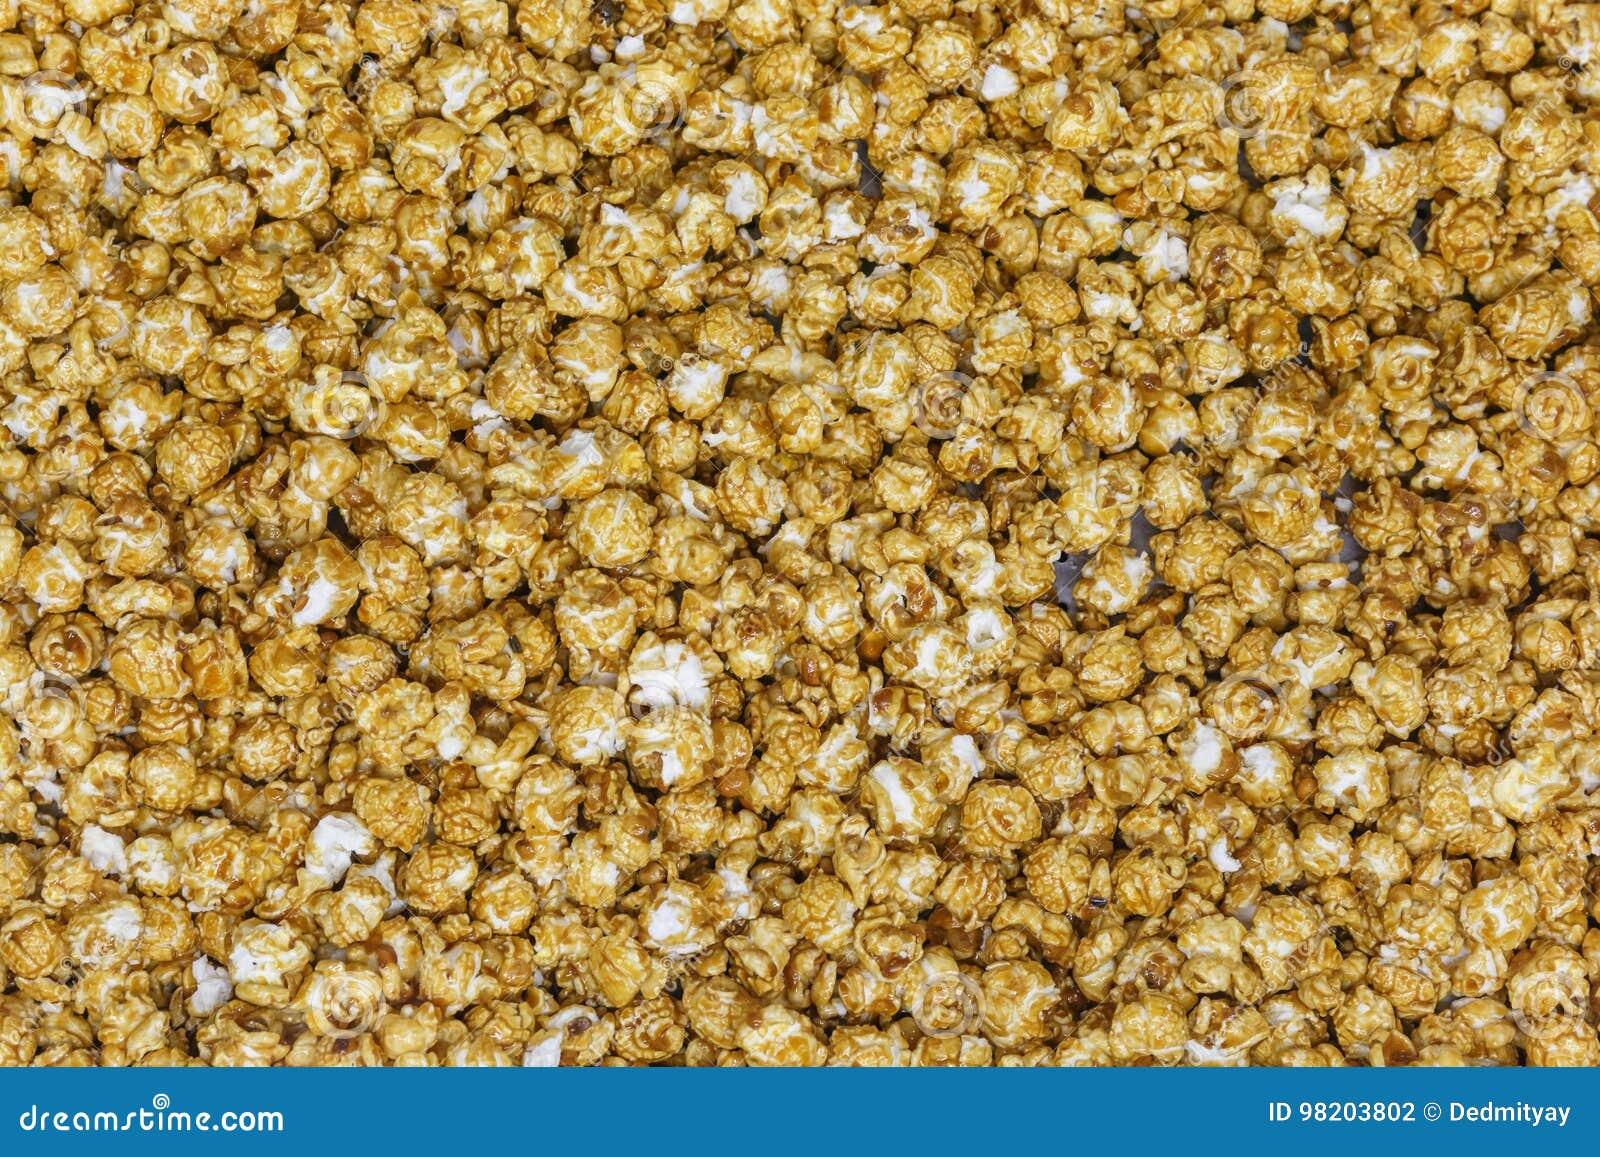 Caramel popcorn texture background